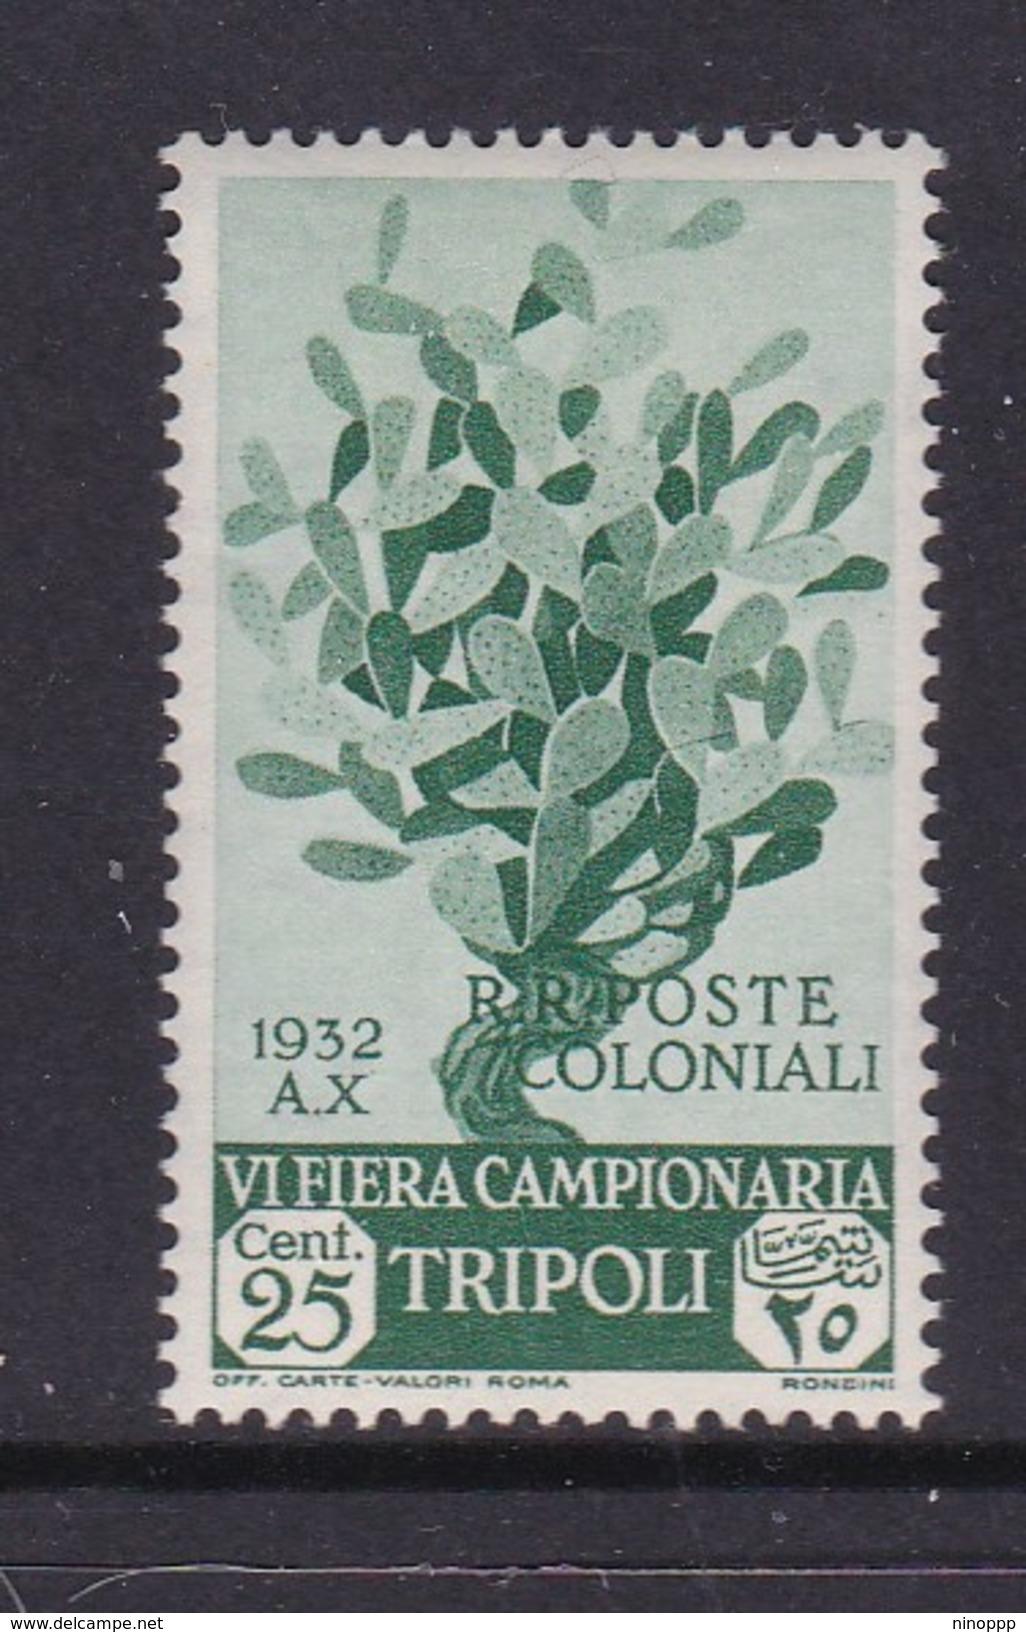 Italy-Colonies And Territories-Libya S 110 1932 Sixth Sample Fair,Tripoli ,25c Green,papaya Tree,mint Hinged - Libya